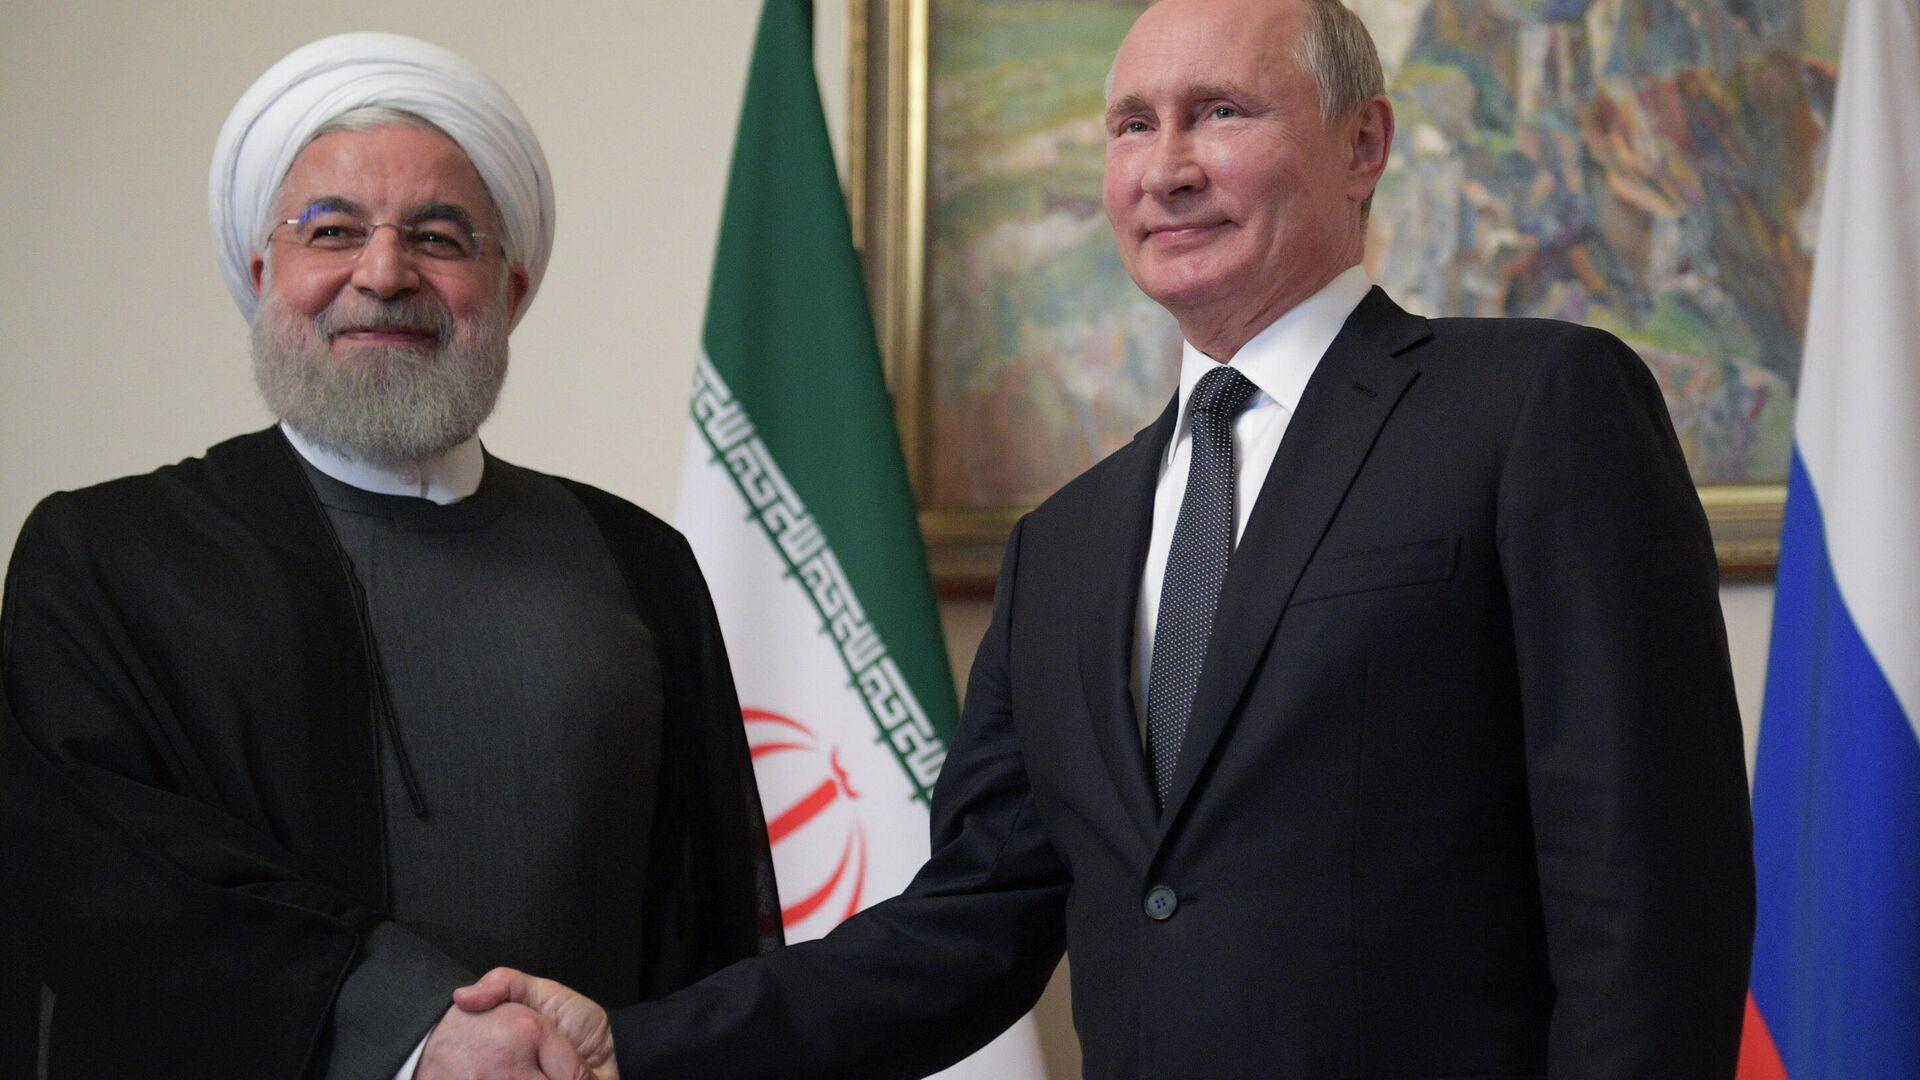 Президент РФ Владимир Путин и президент Исламской Республики Иран Хасан Роухани во время встречи в рамках саммита ЕАЭС - РИА Новости, 1920, 29.02.2020